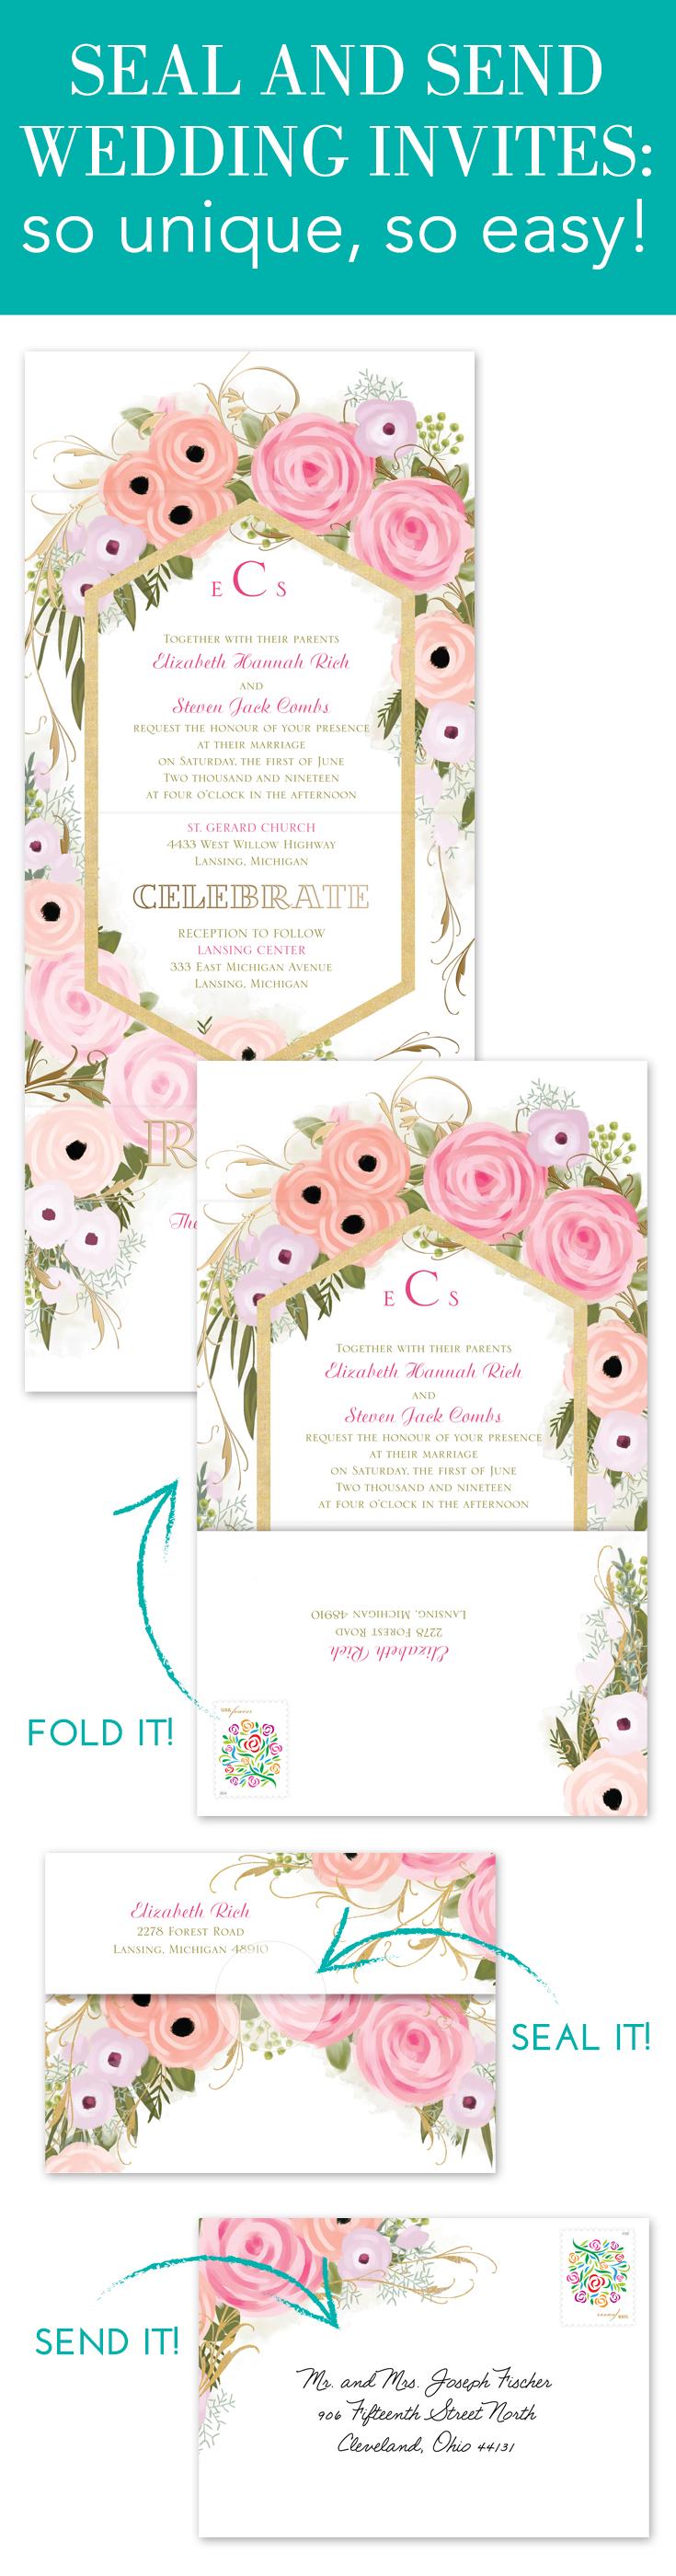 70+ Best Wedding invites images | wedding, wedding cards, wedding  invitations